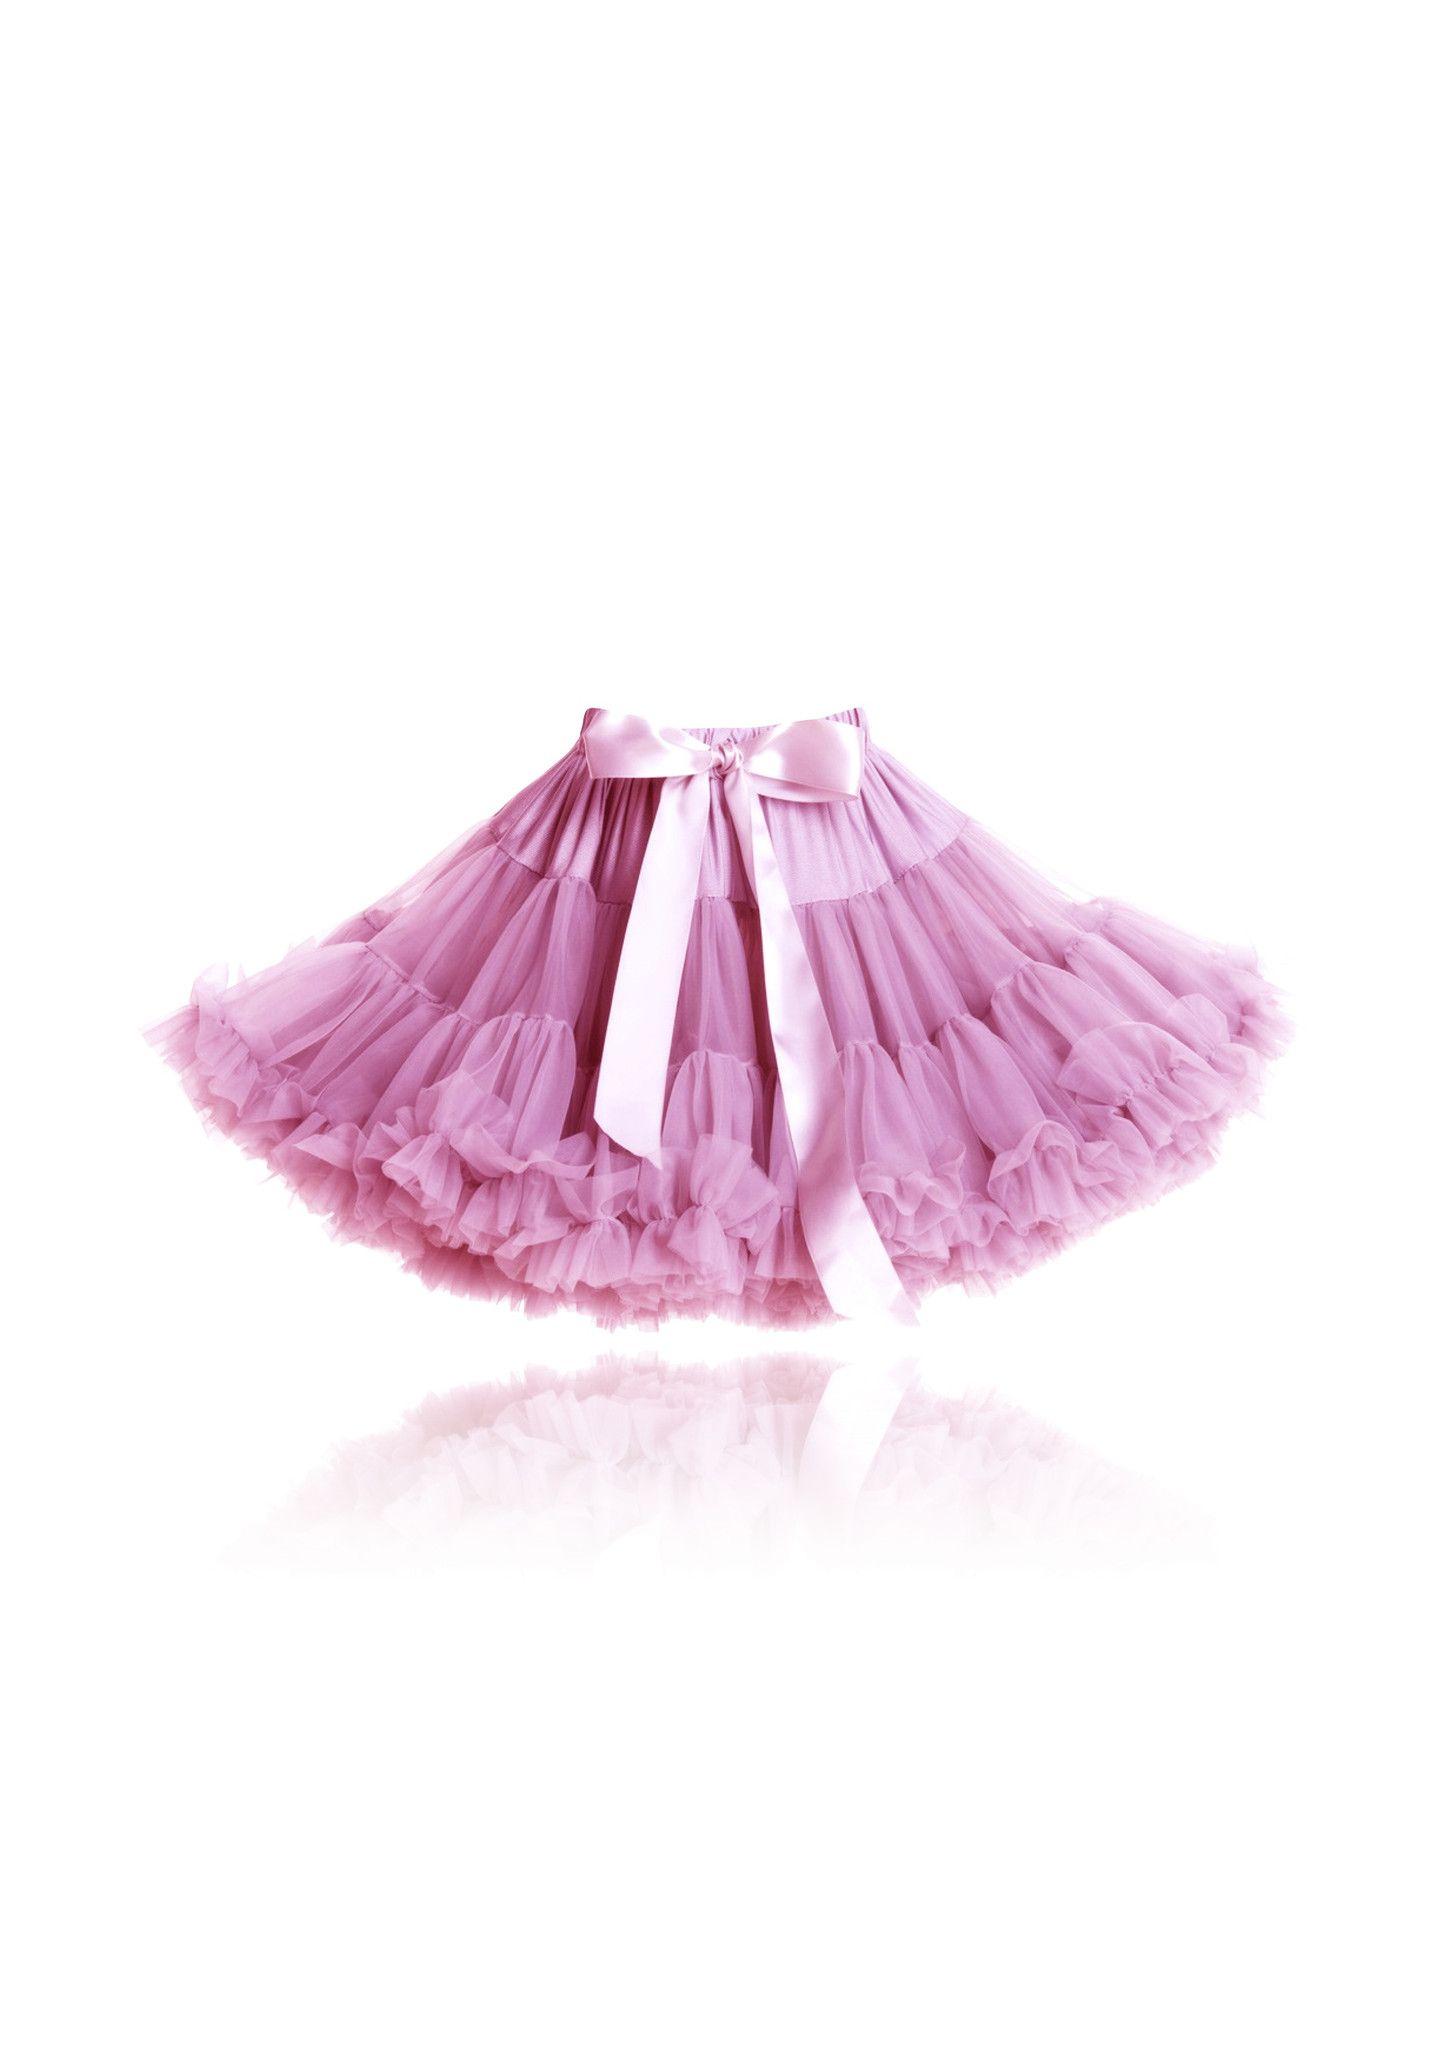 fa185ea25 DOLLY by Le Petit Tom ® PINKEST PINK PRINCESS pettiskirt pinkest pink